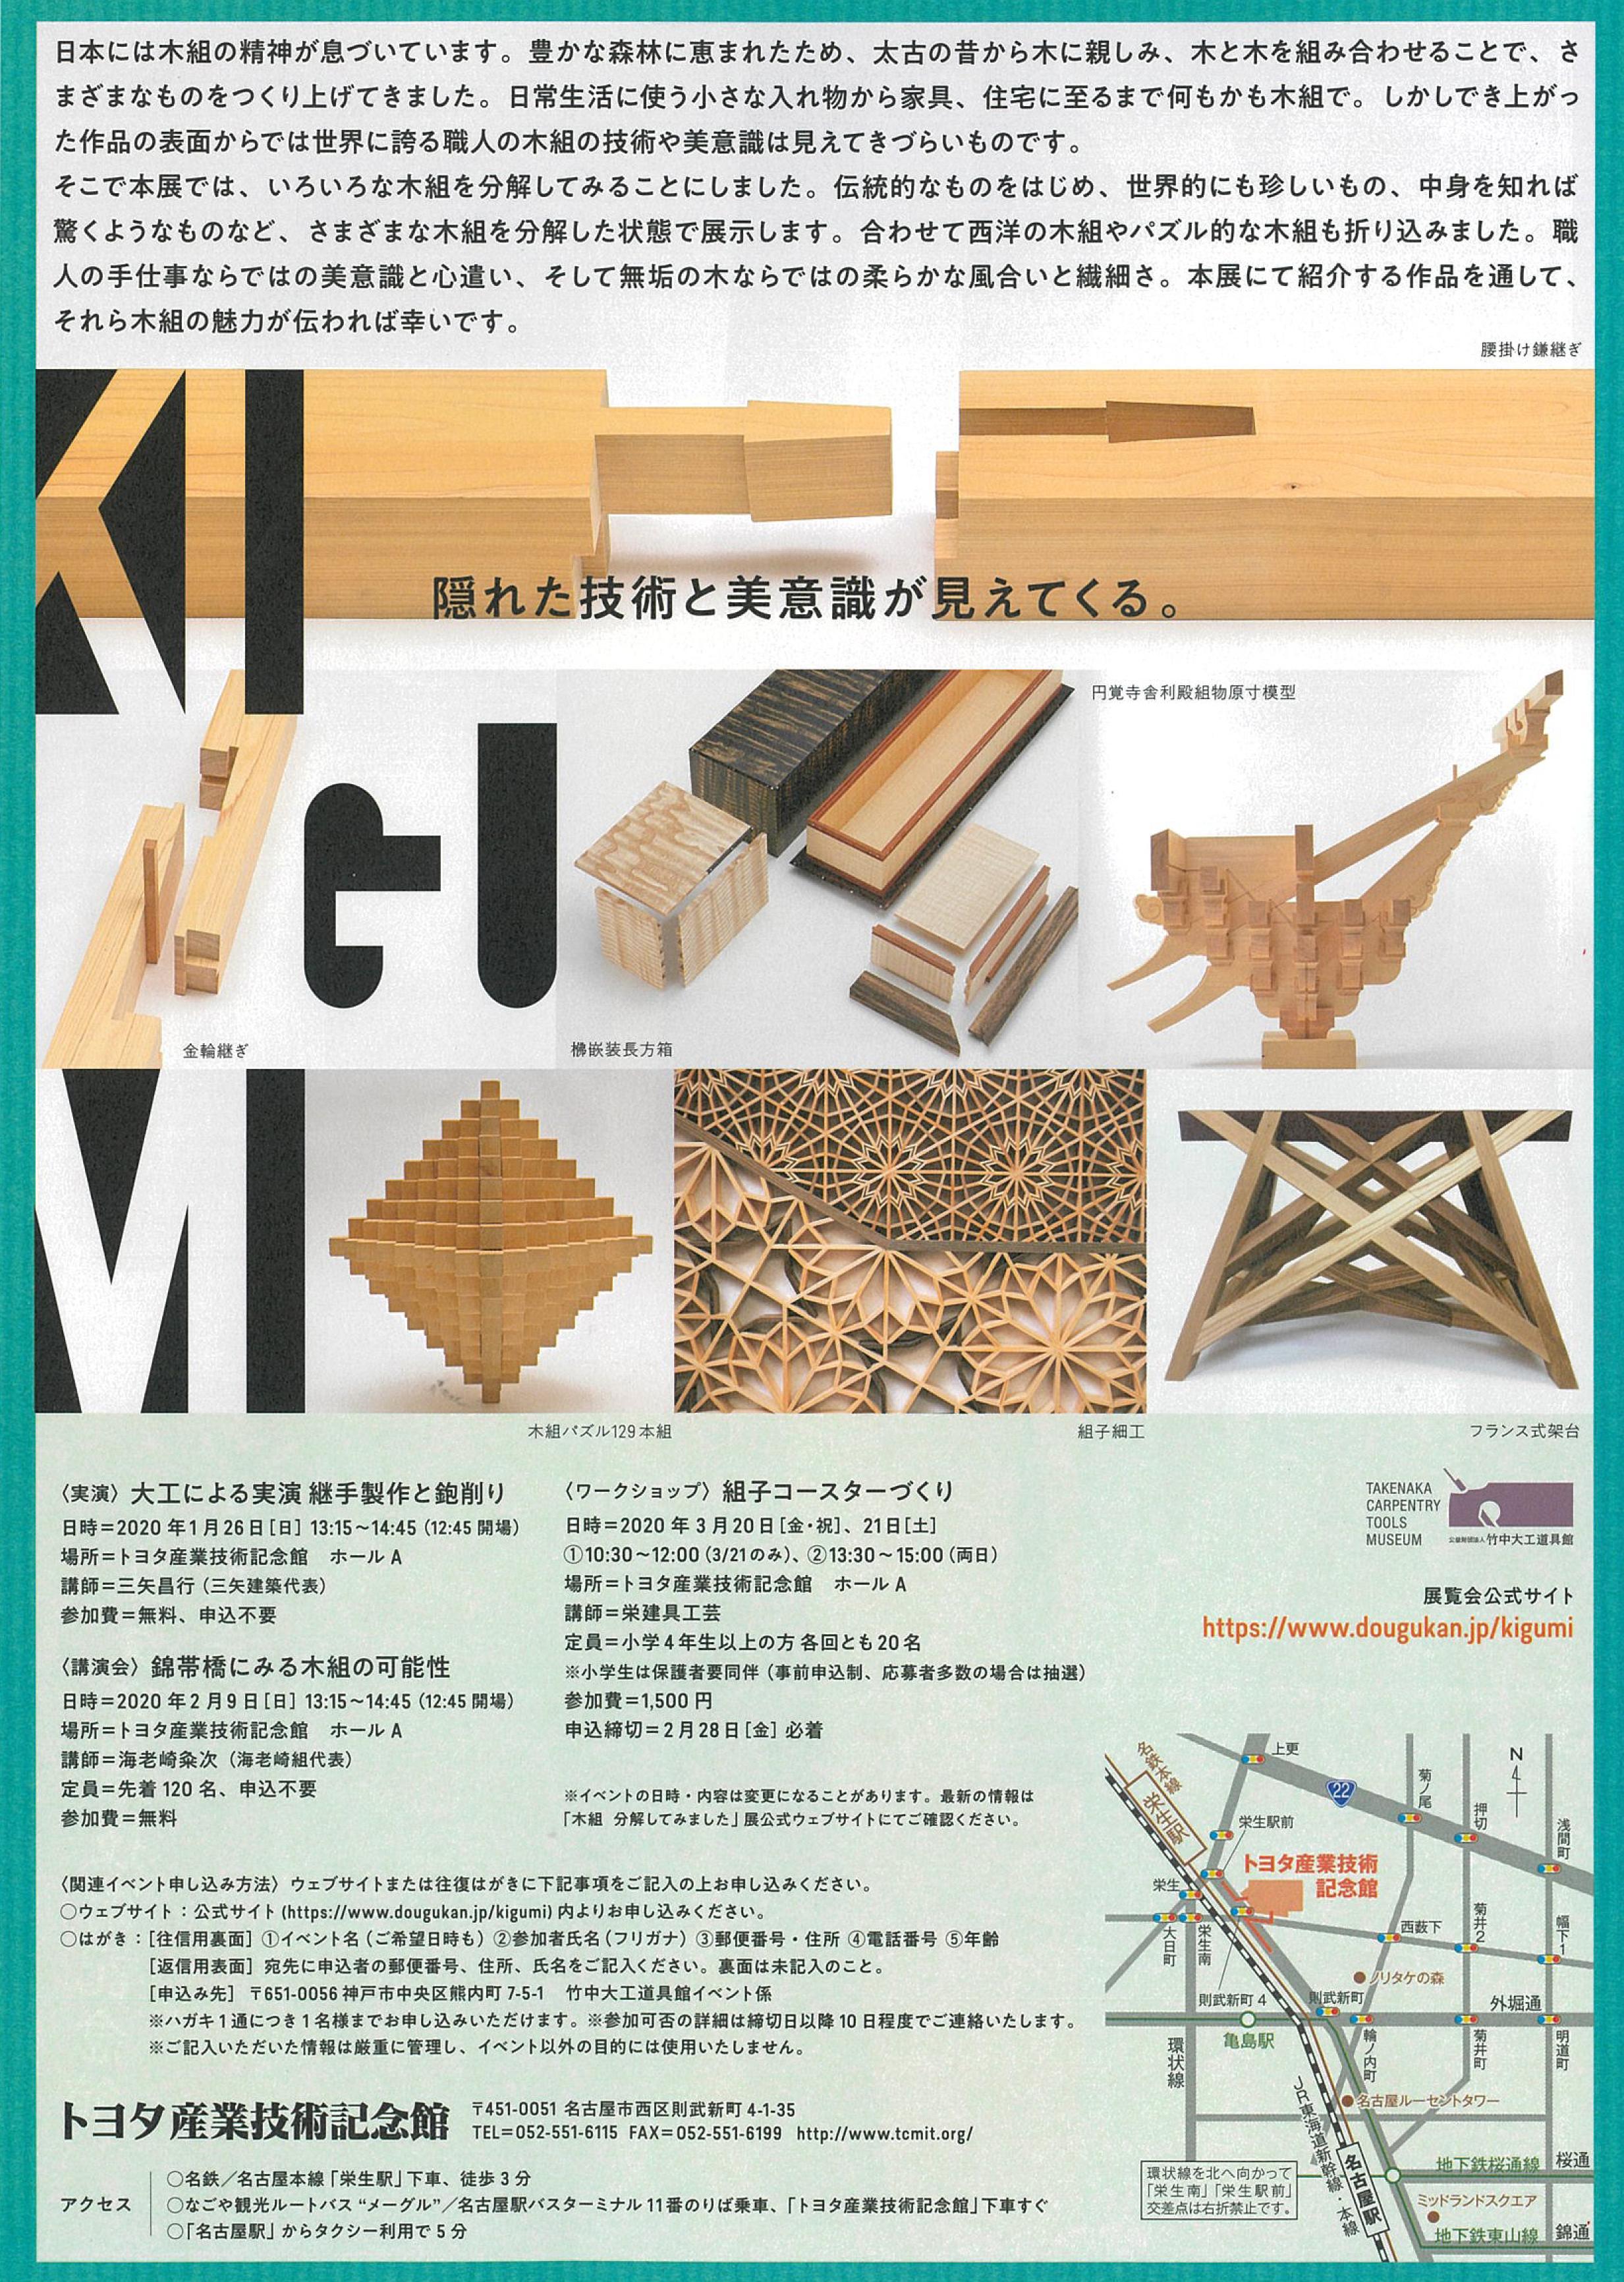 竹中大工道具館企画展「木組」チラシ裏